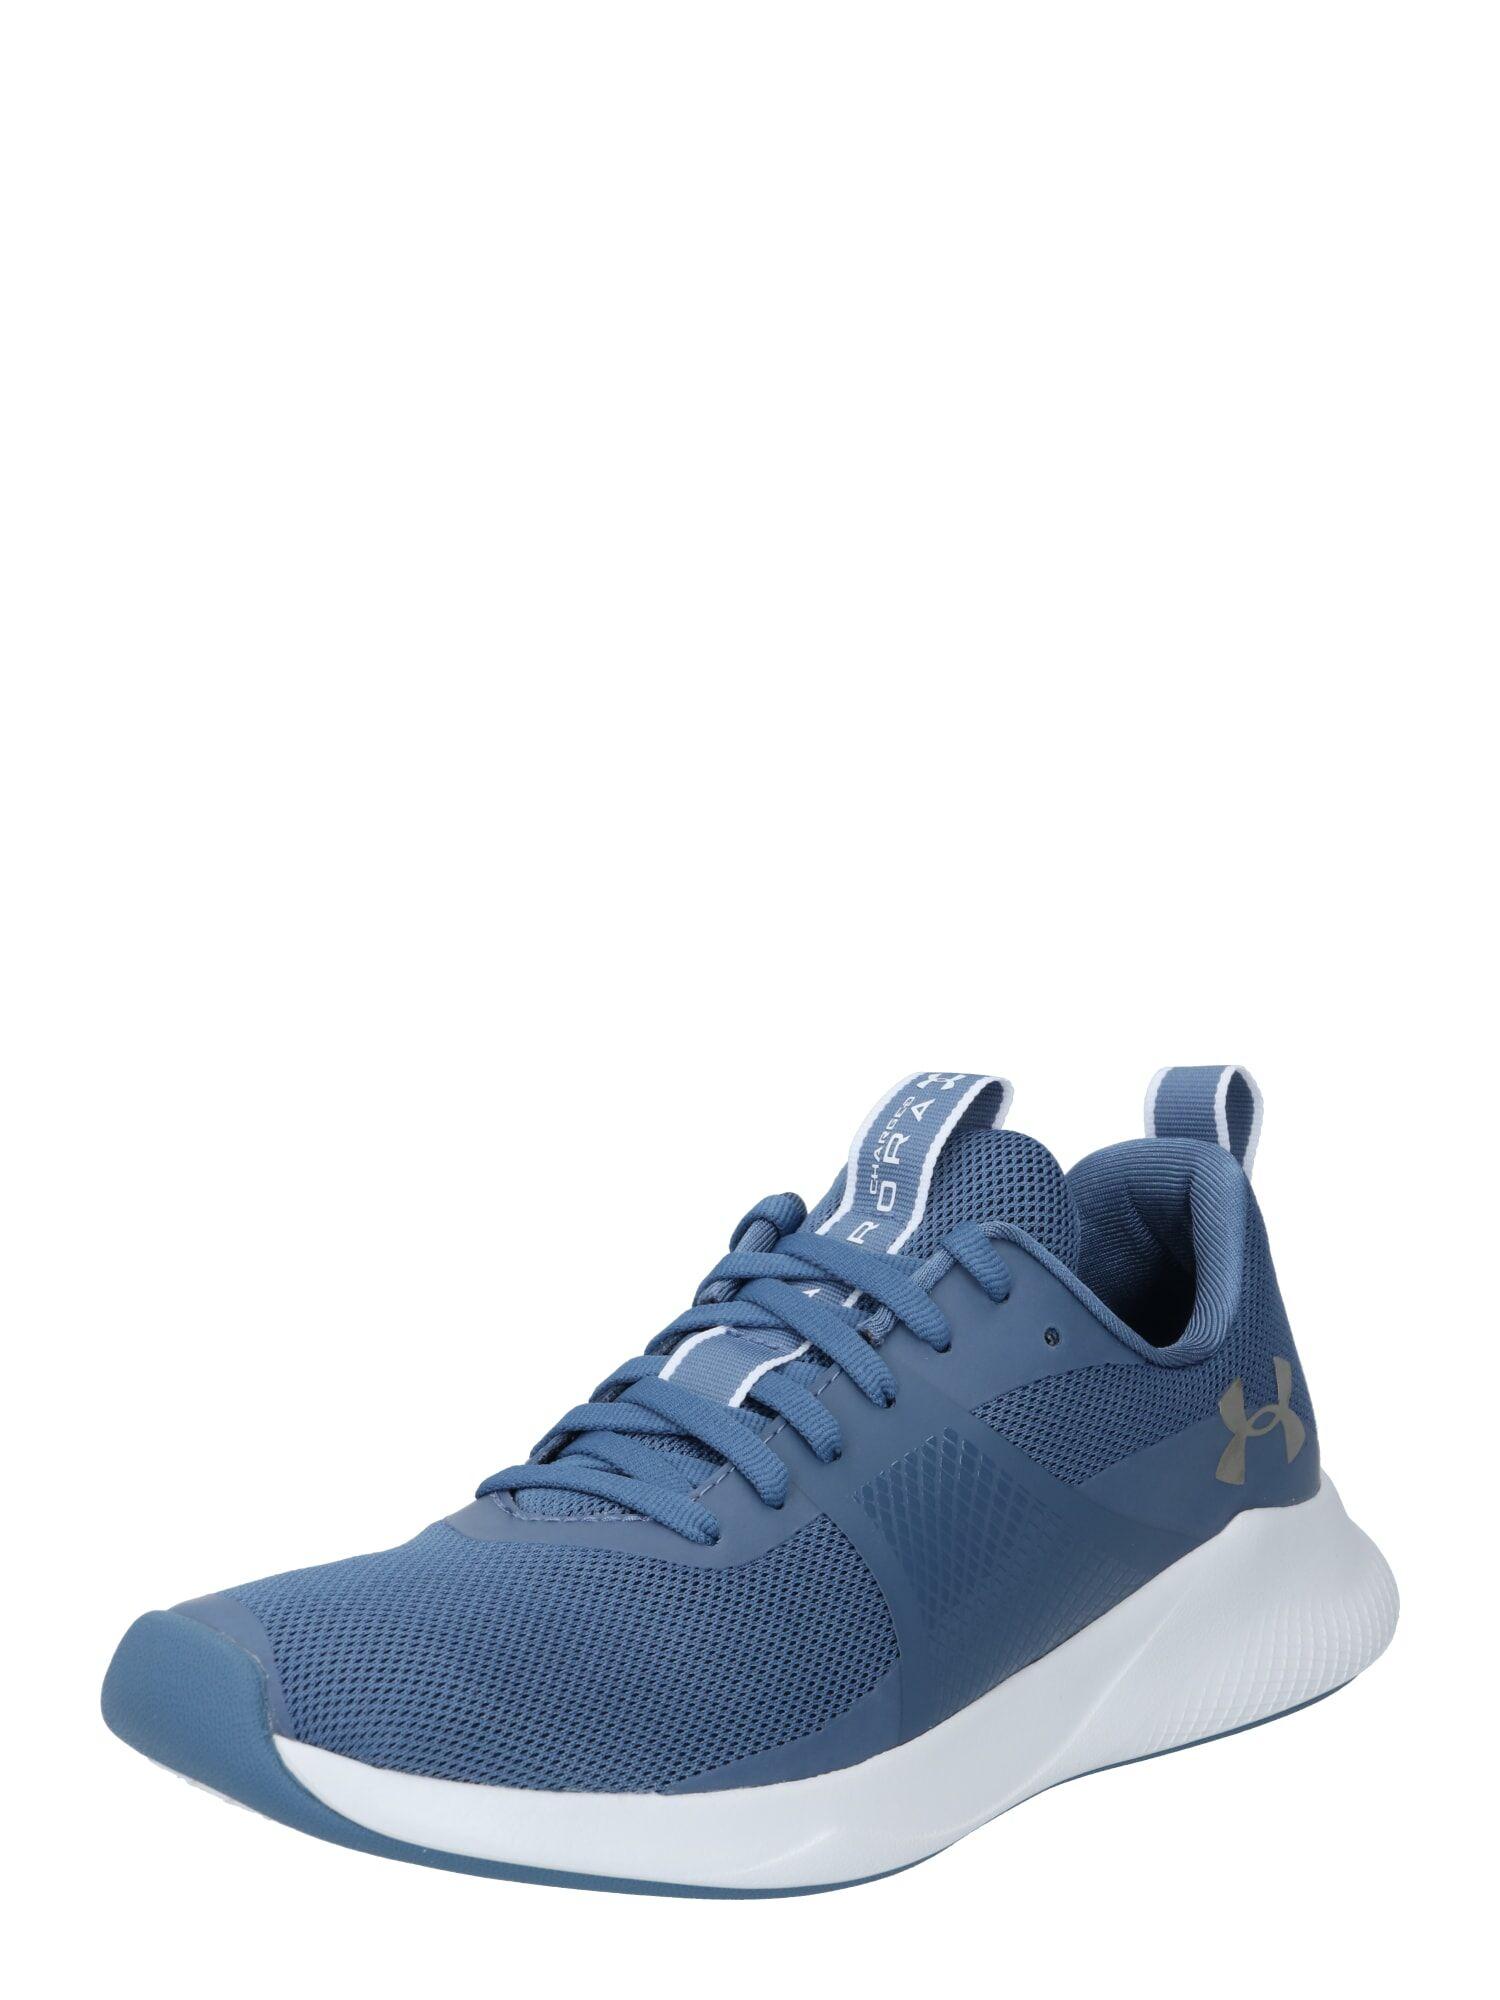 UNDER ARMOUR Chaussure de sport 'Aurora'  - Bleu - Taille: 7 - female